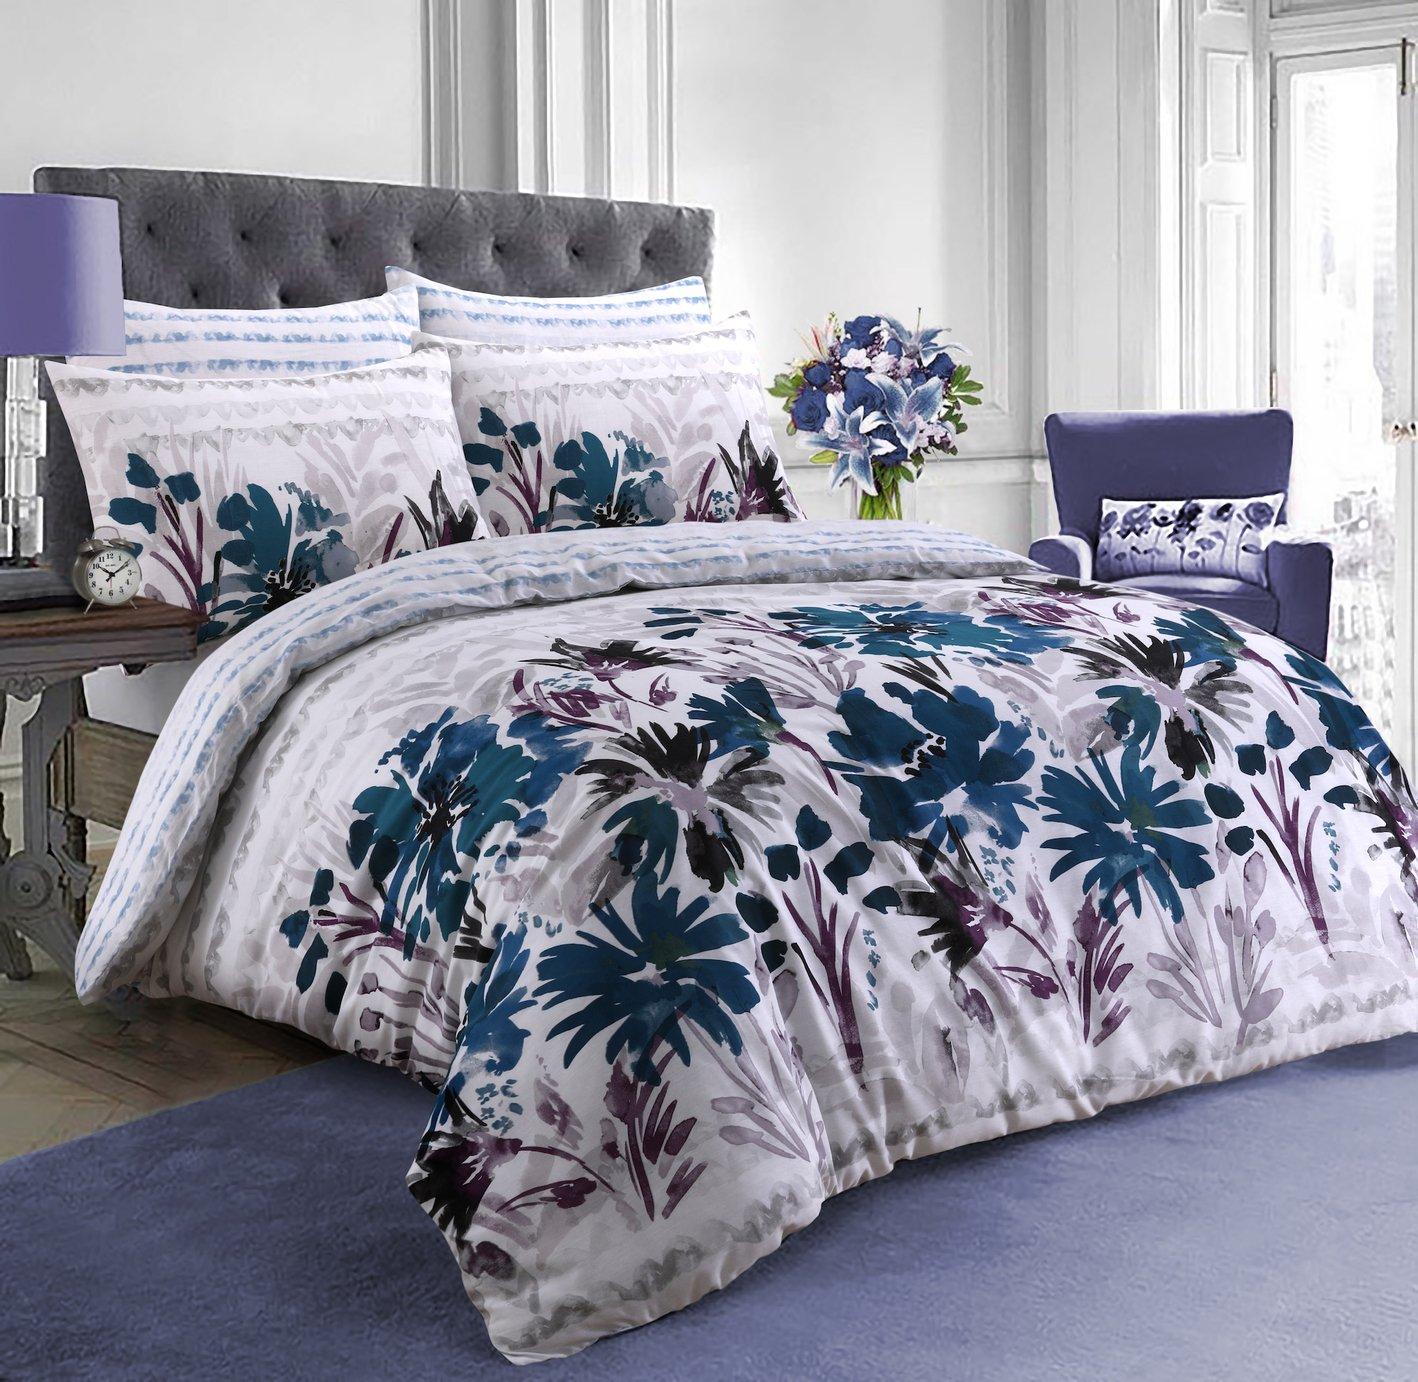 Argos Home Teal Garden Flowers Bedding Set - Superking